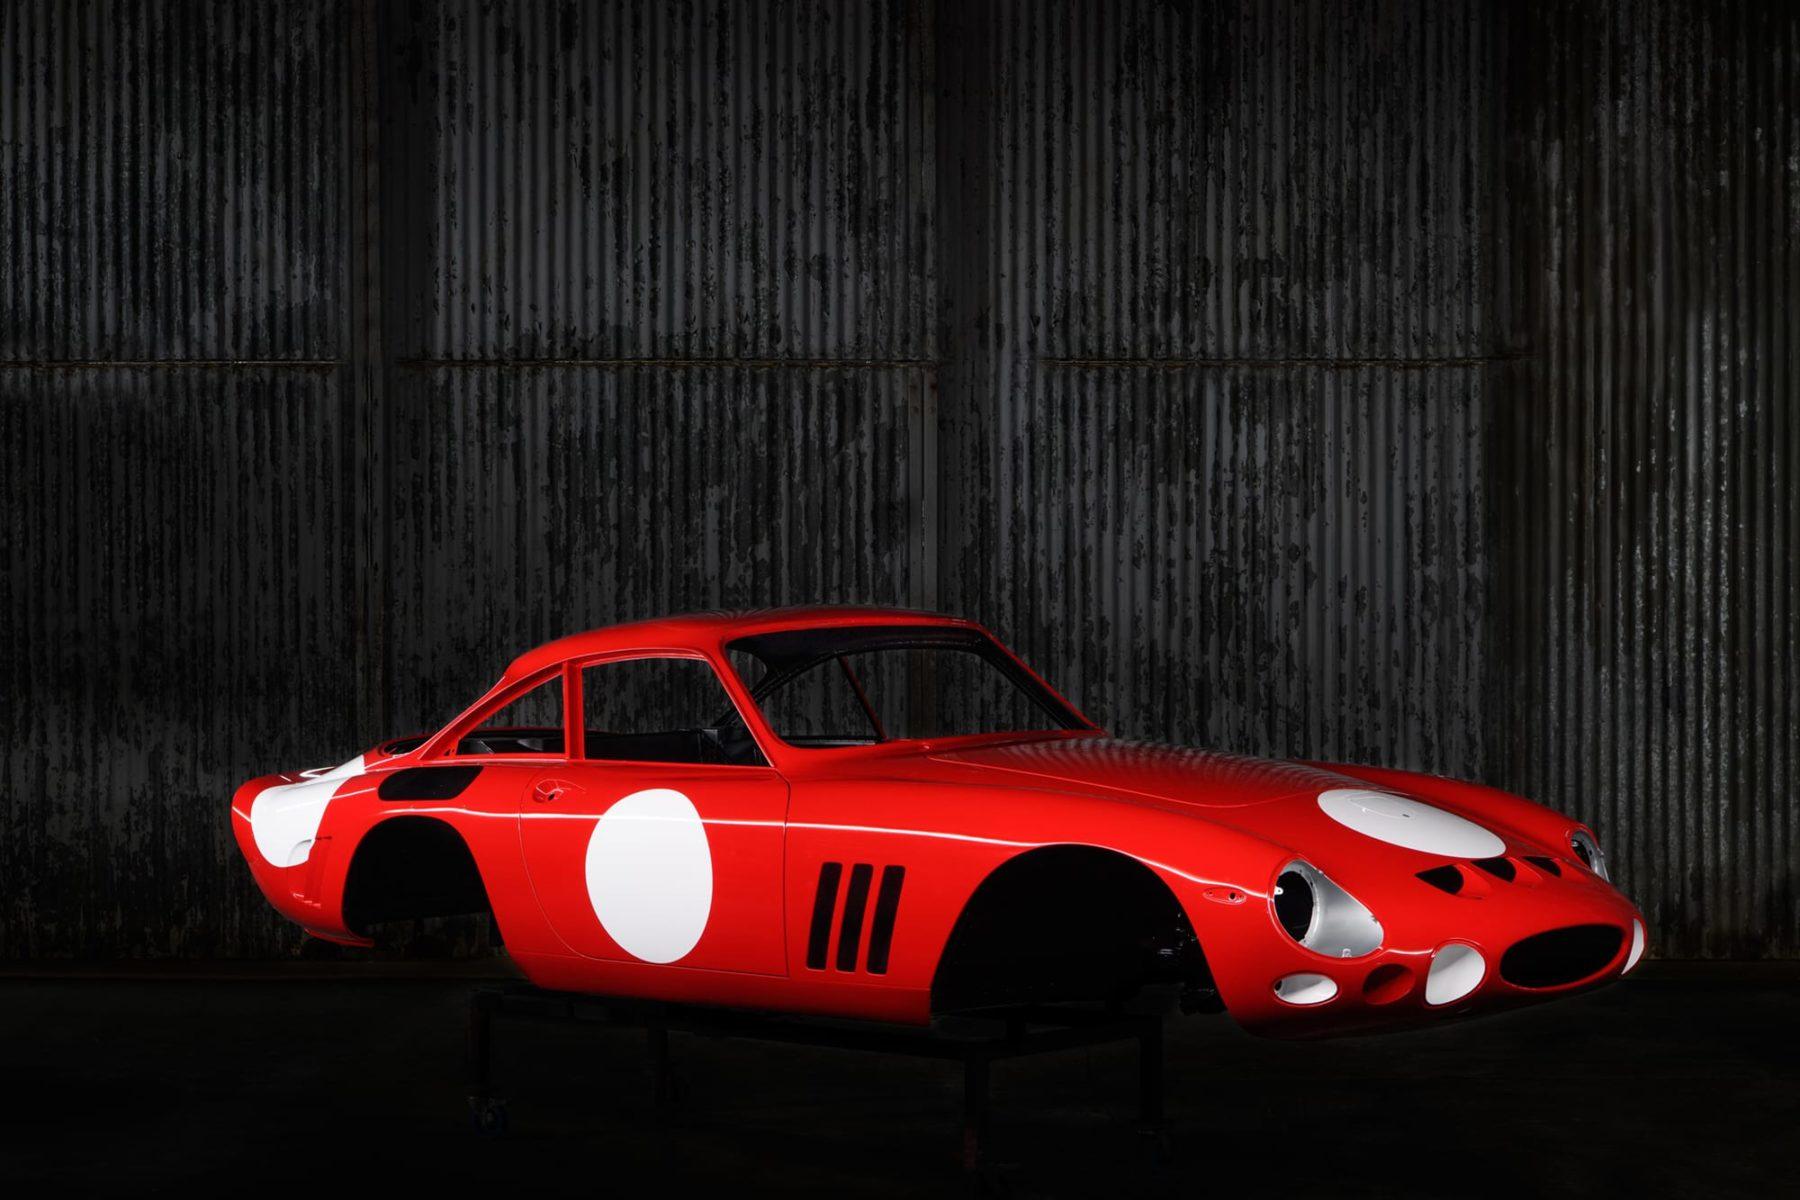 Ferrari 330 LMB Restoration